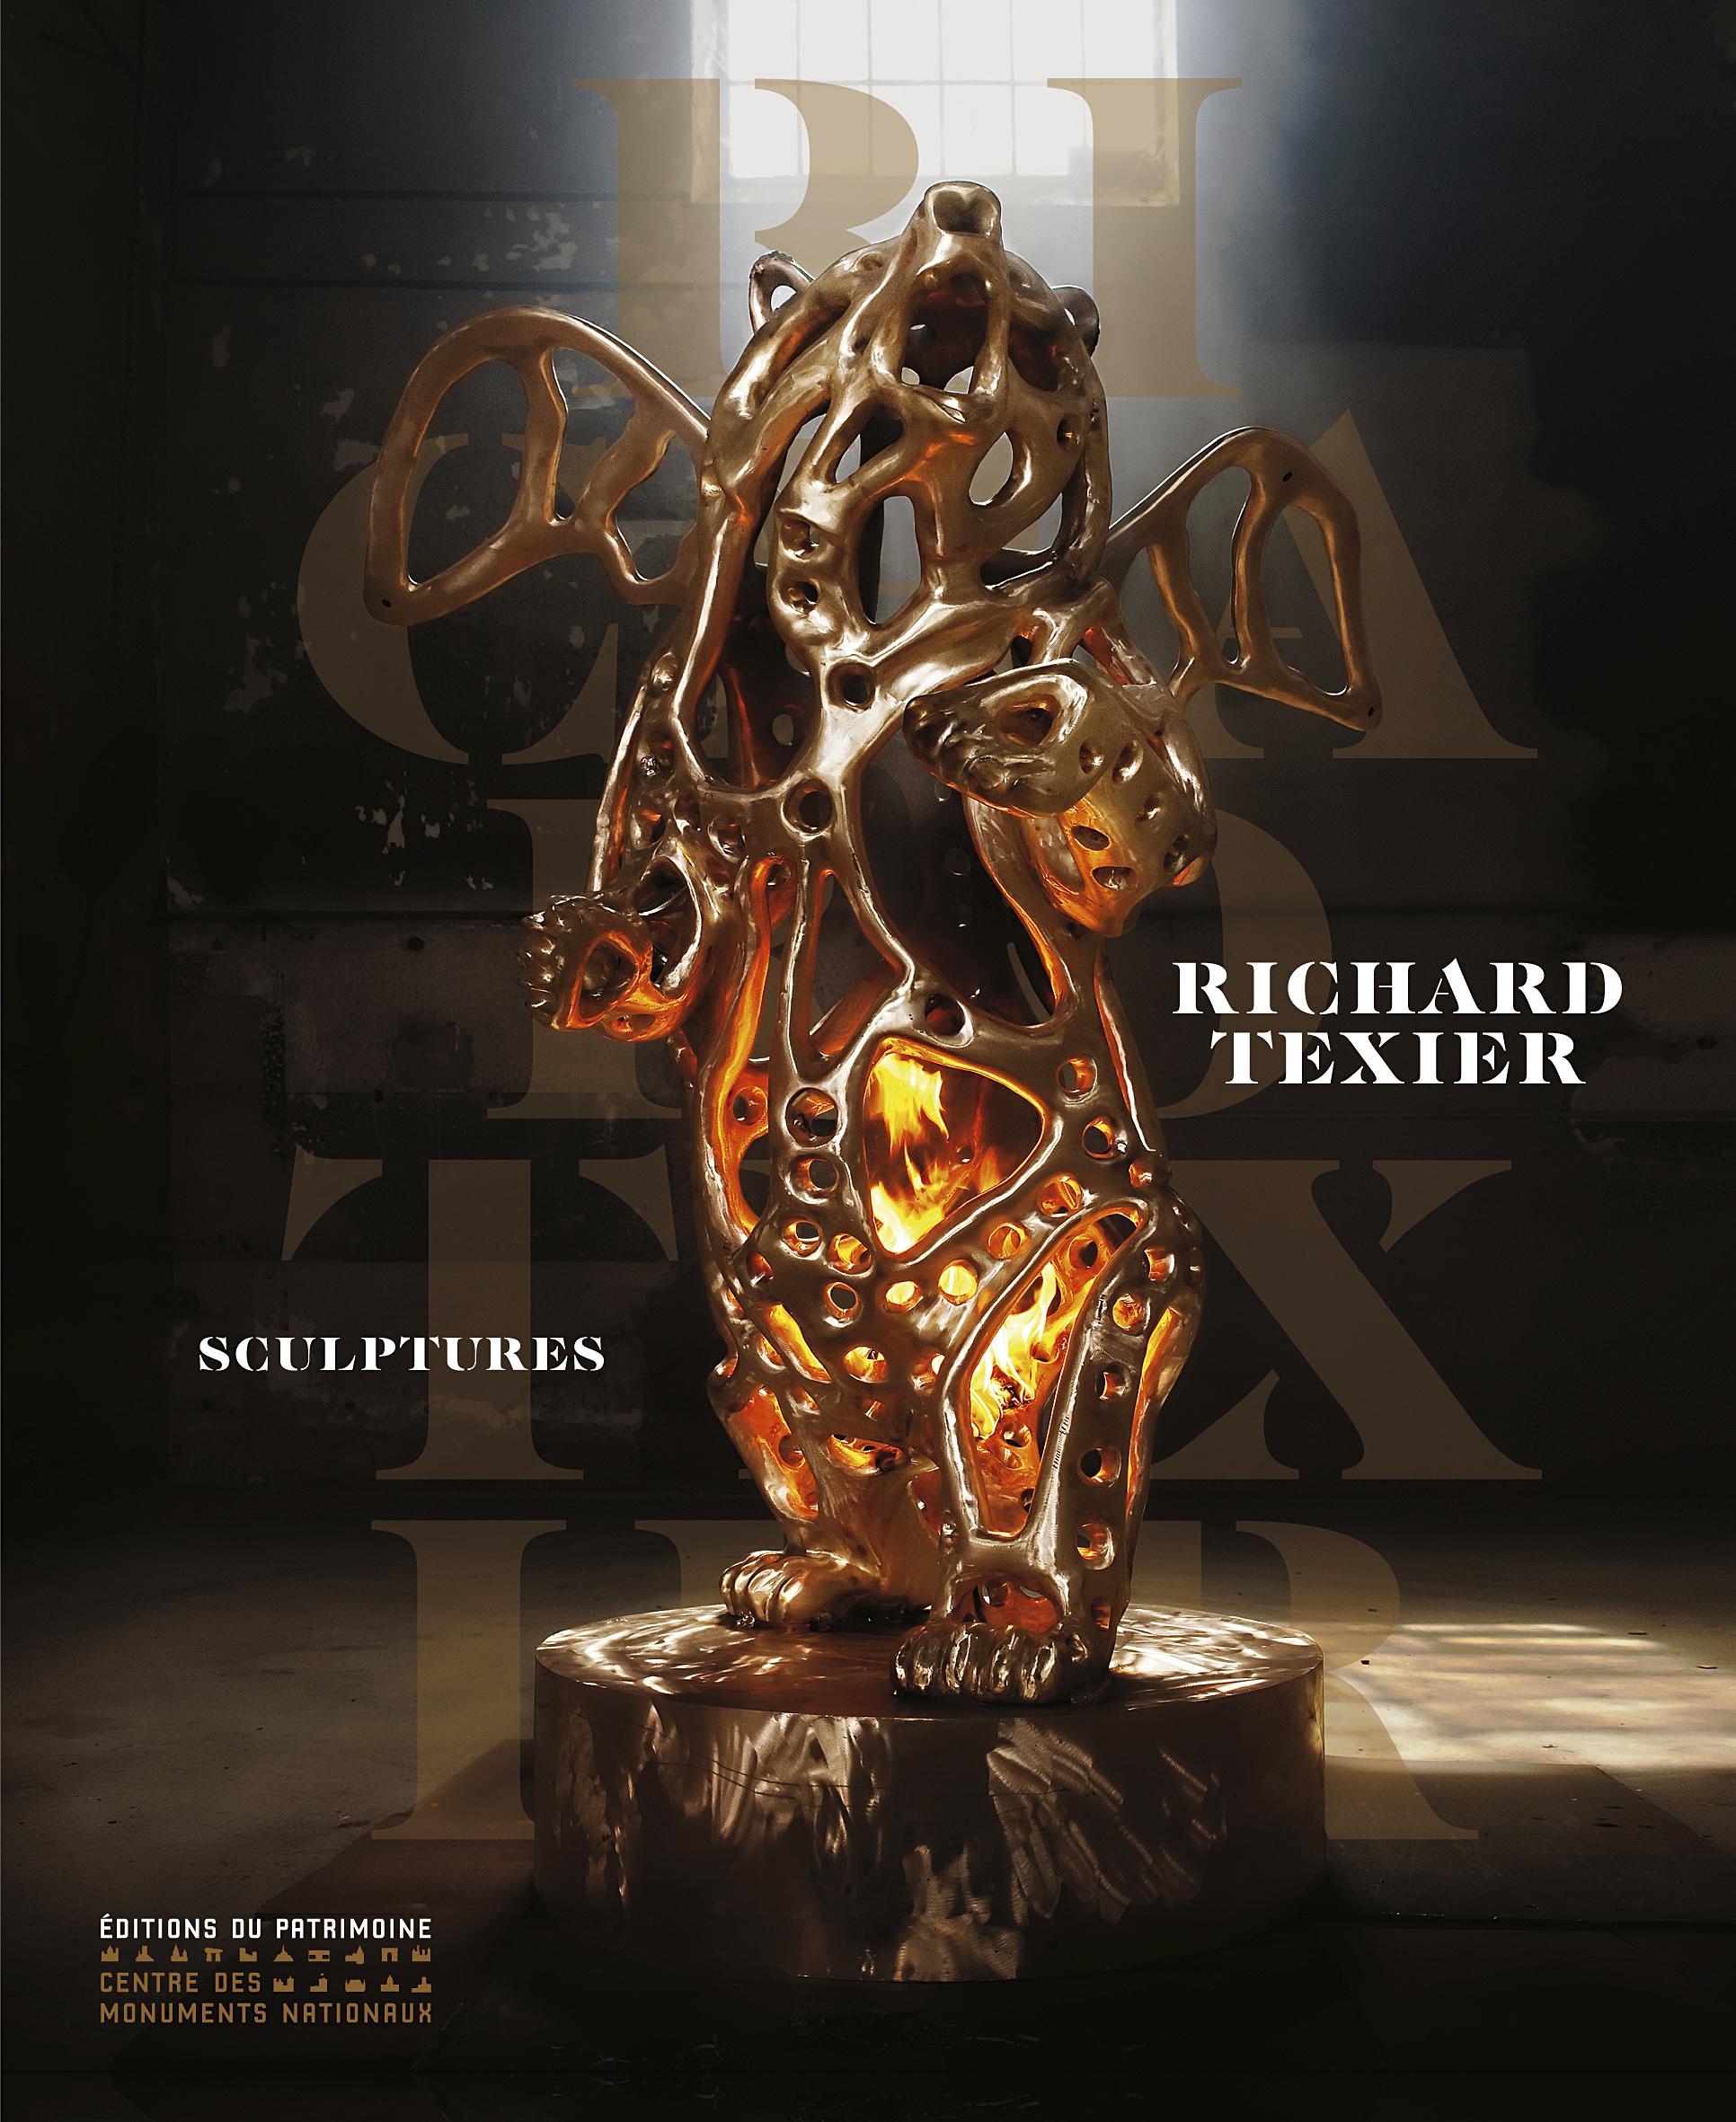 Richard Texier Sculpture Book of his art